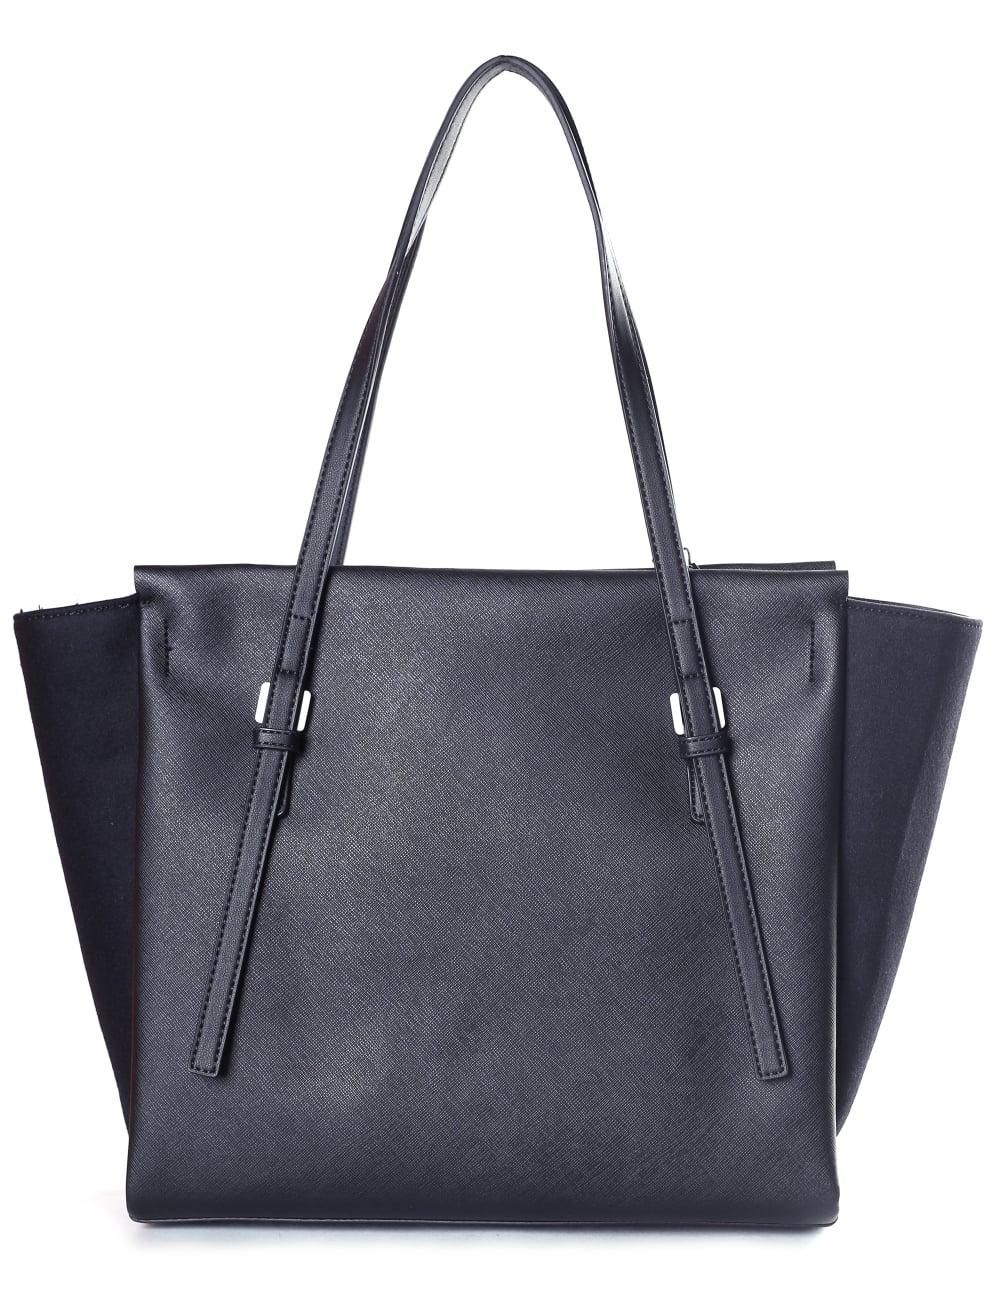 Calvin Klein Women s Marissa Textured Large Tote Bag Black 703b741c1a